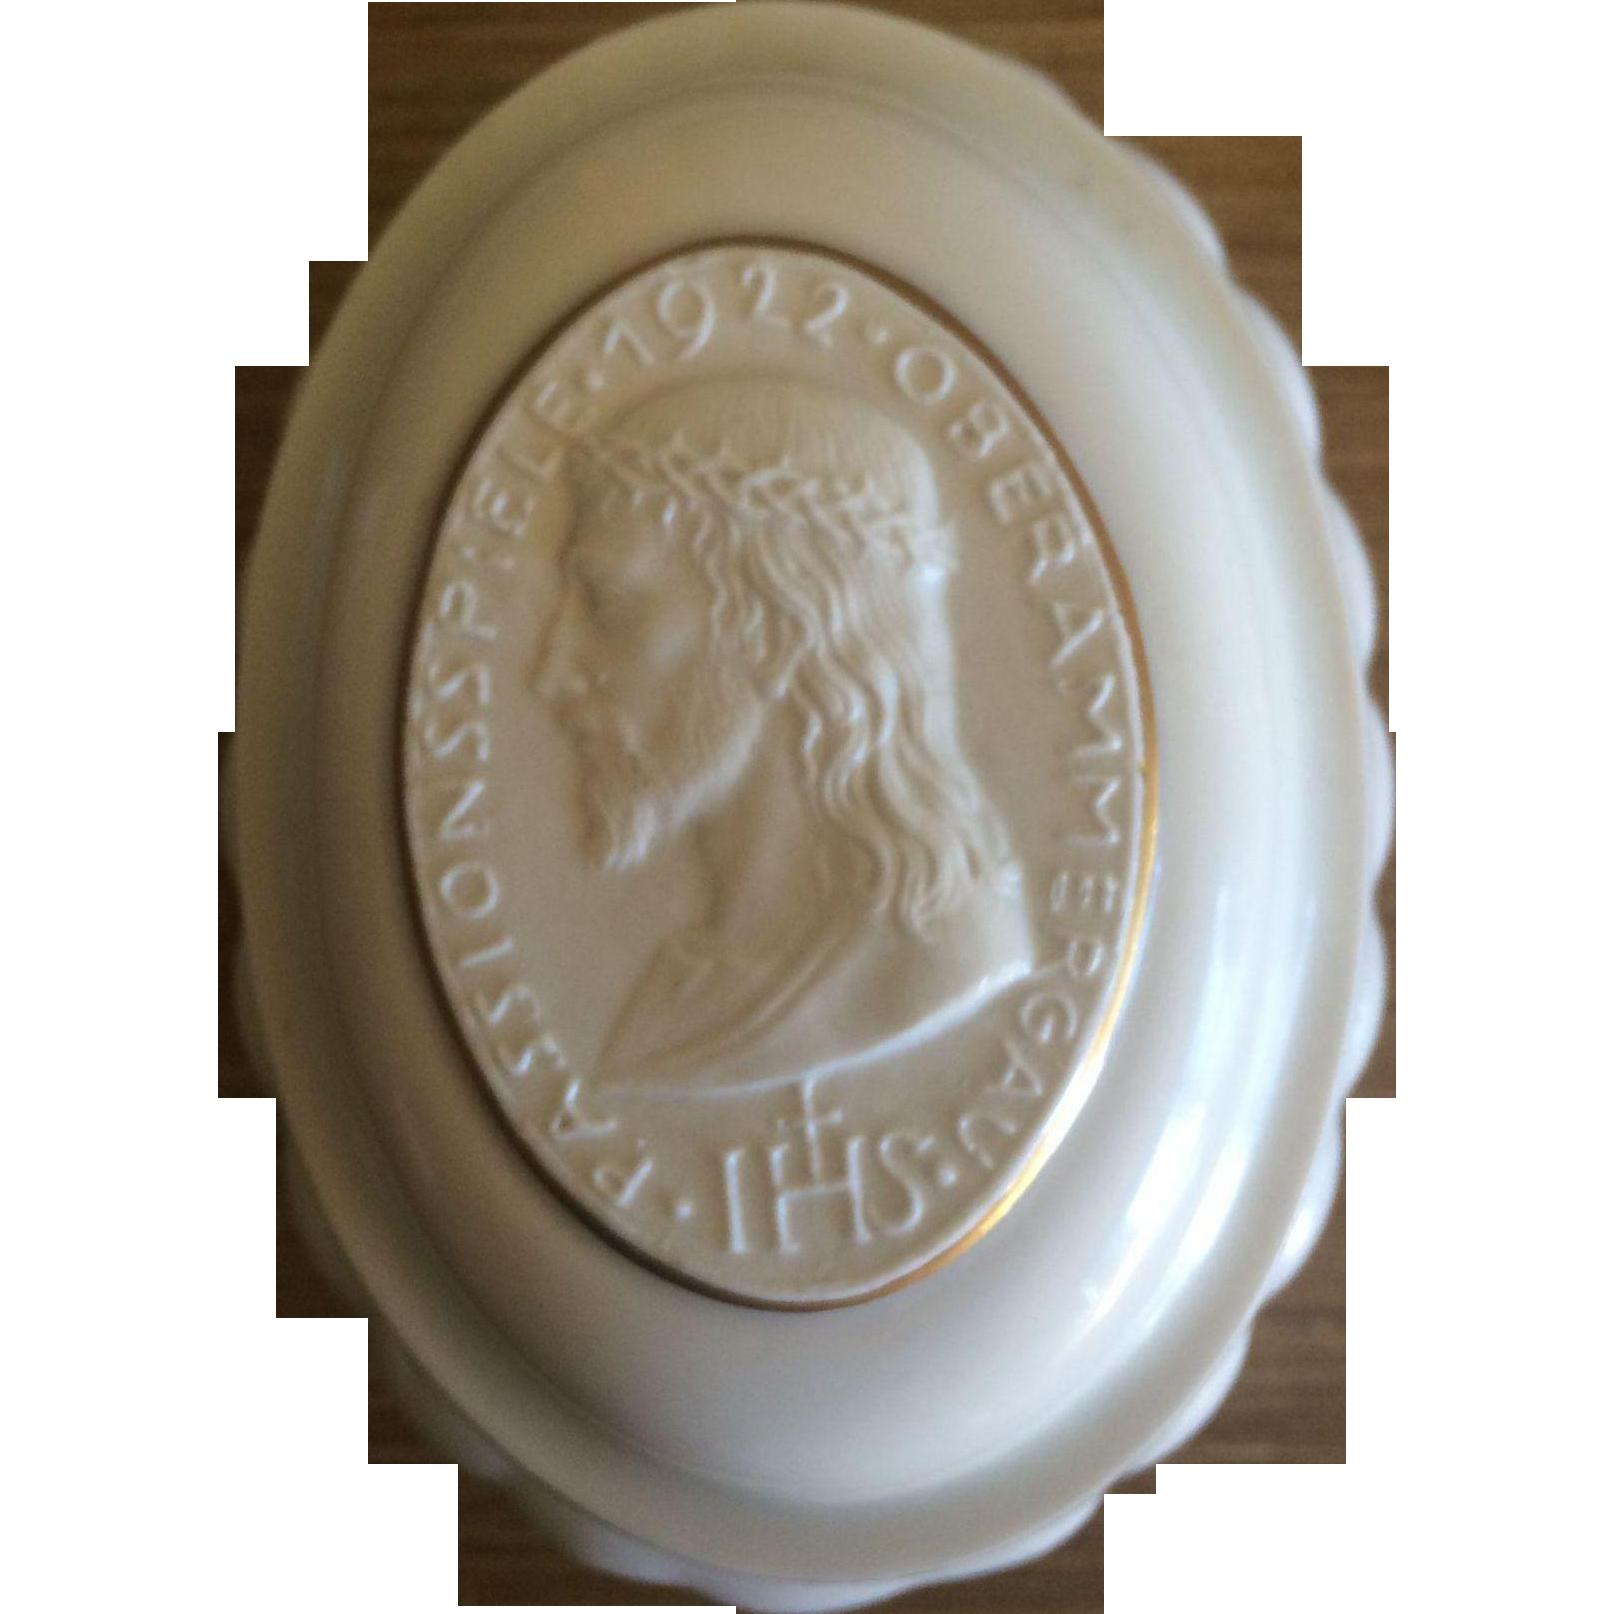 Passionsspiele Oberammergau 1922 Passion Play Commemorative  Hutschenreuther Porcelain Trinket Box